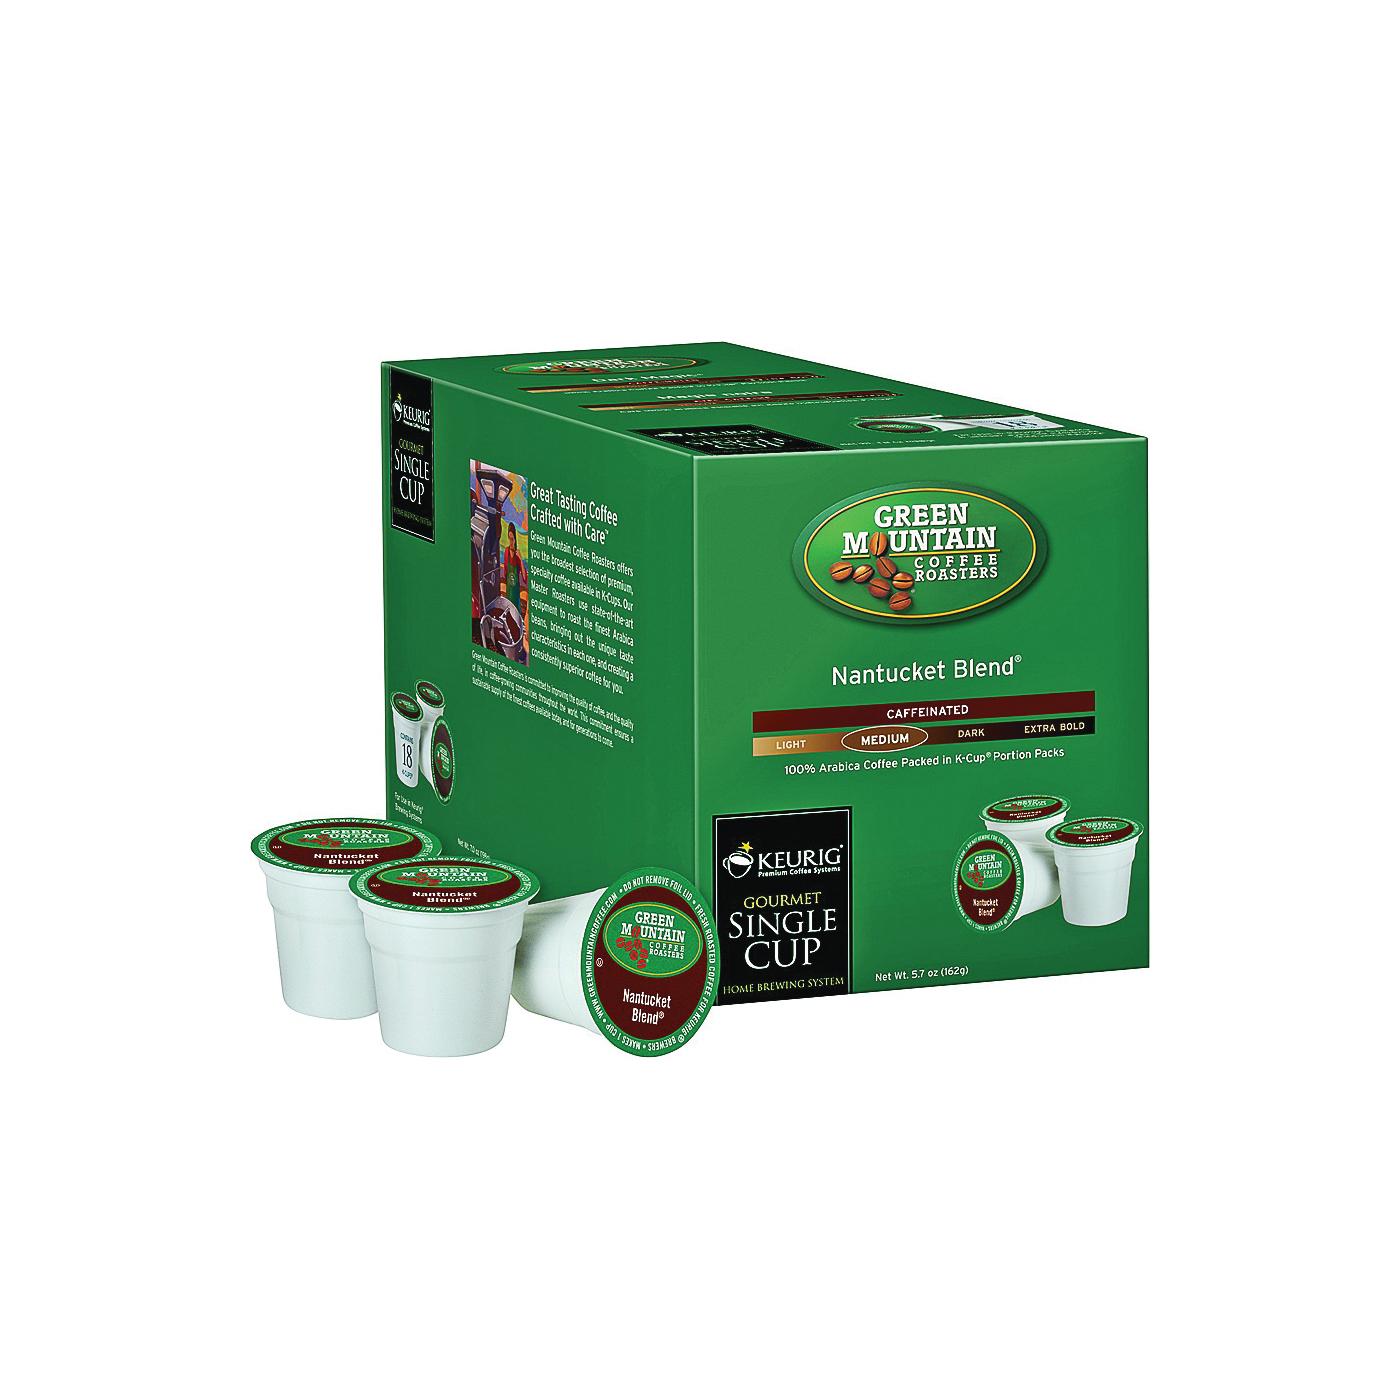 Picture of KEURIG 00663 Coffee K-Cup Pod, Nantucket Blend Flavor, K-Cup Pod